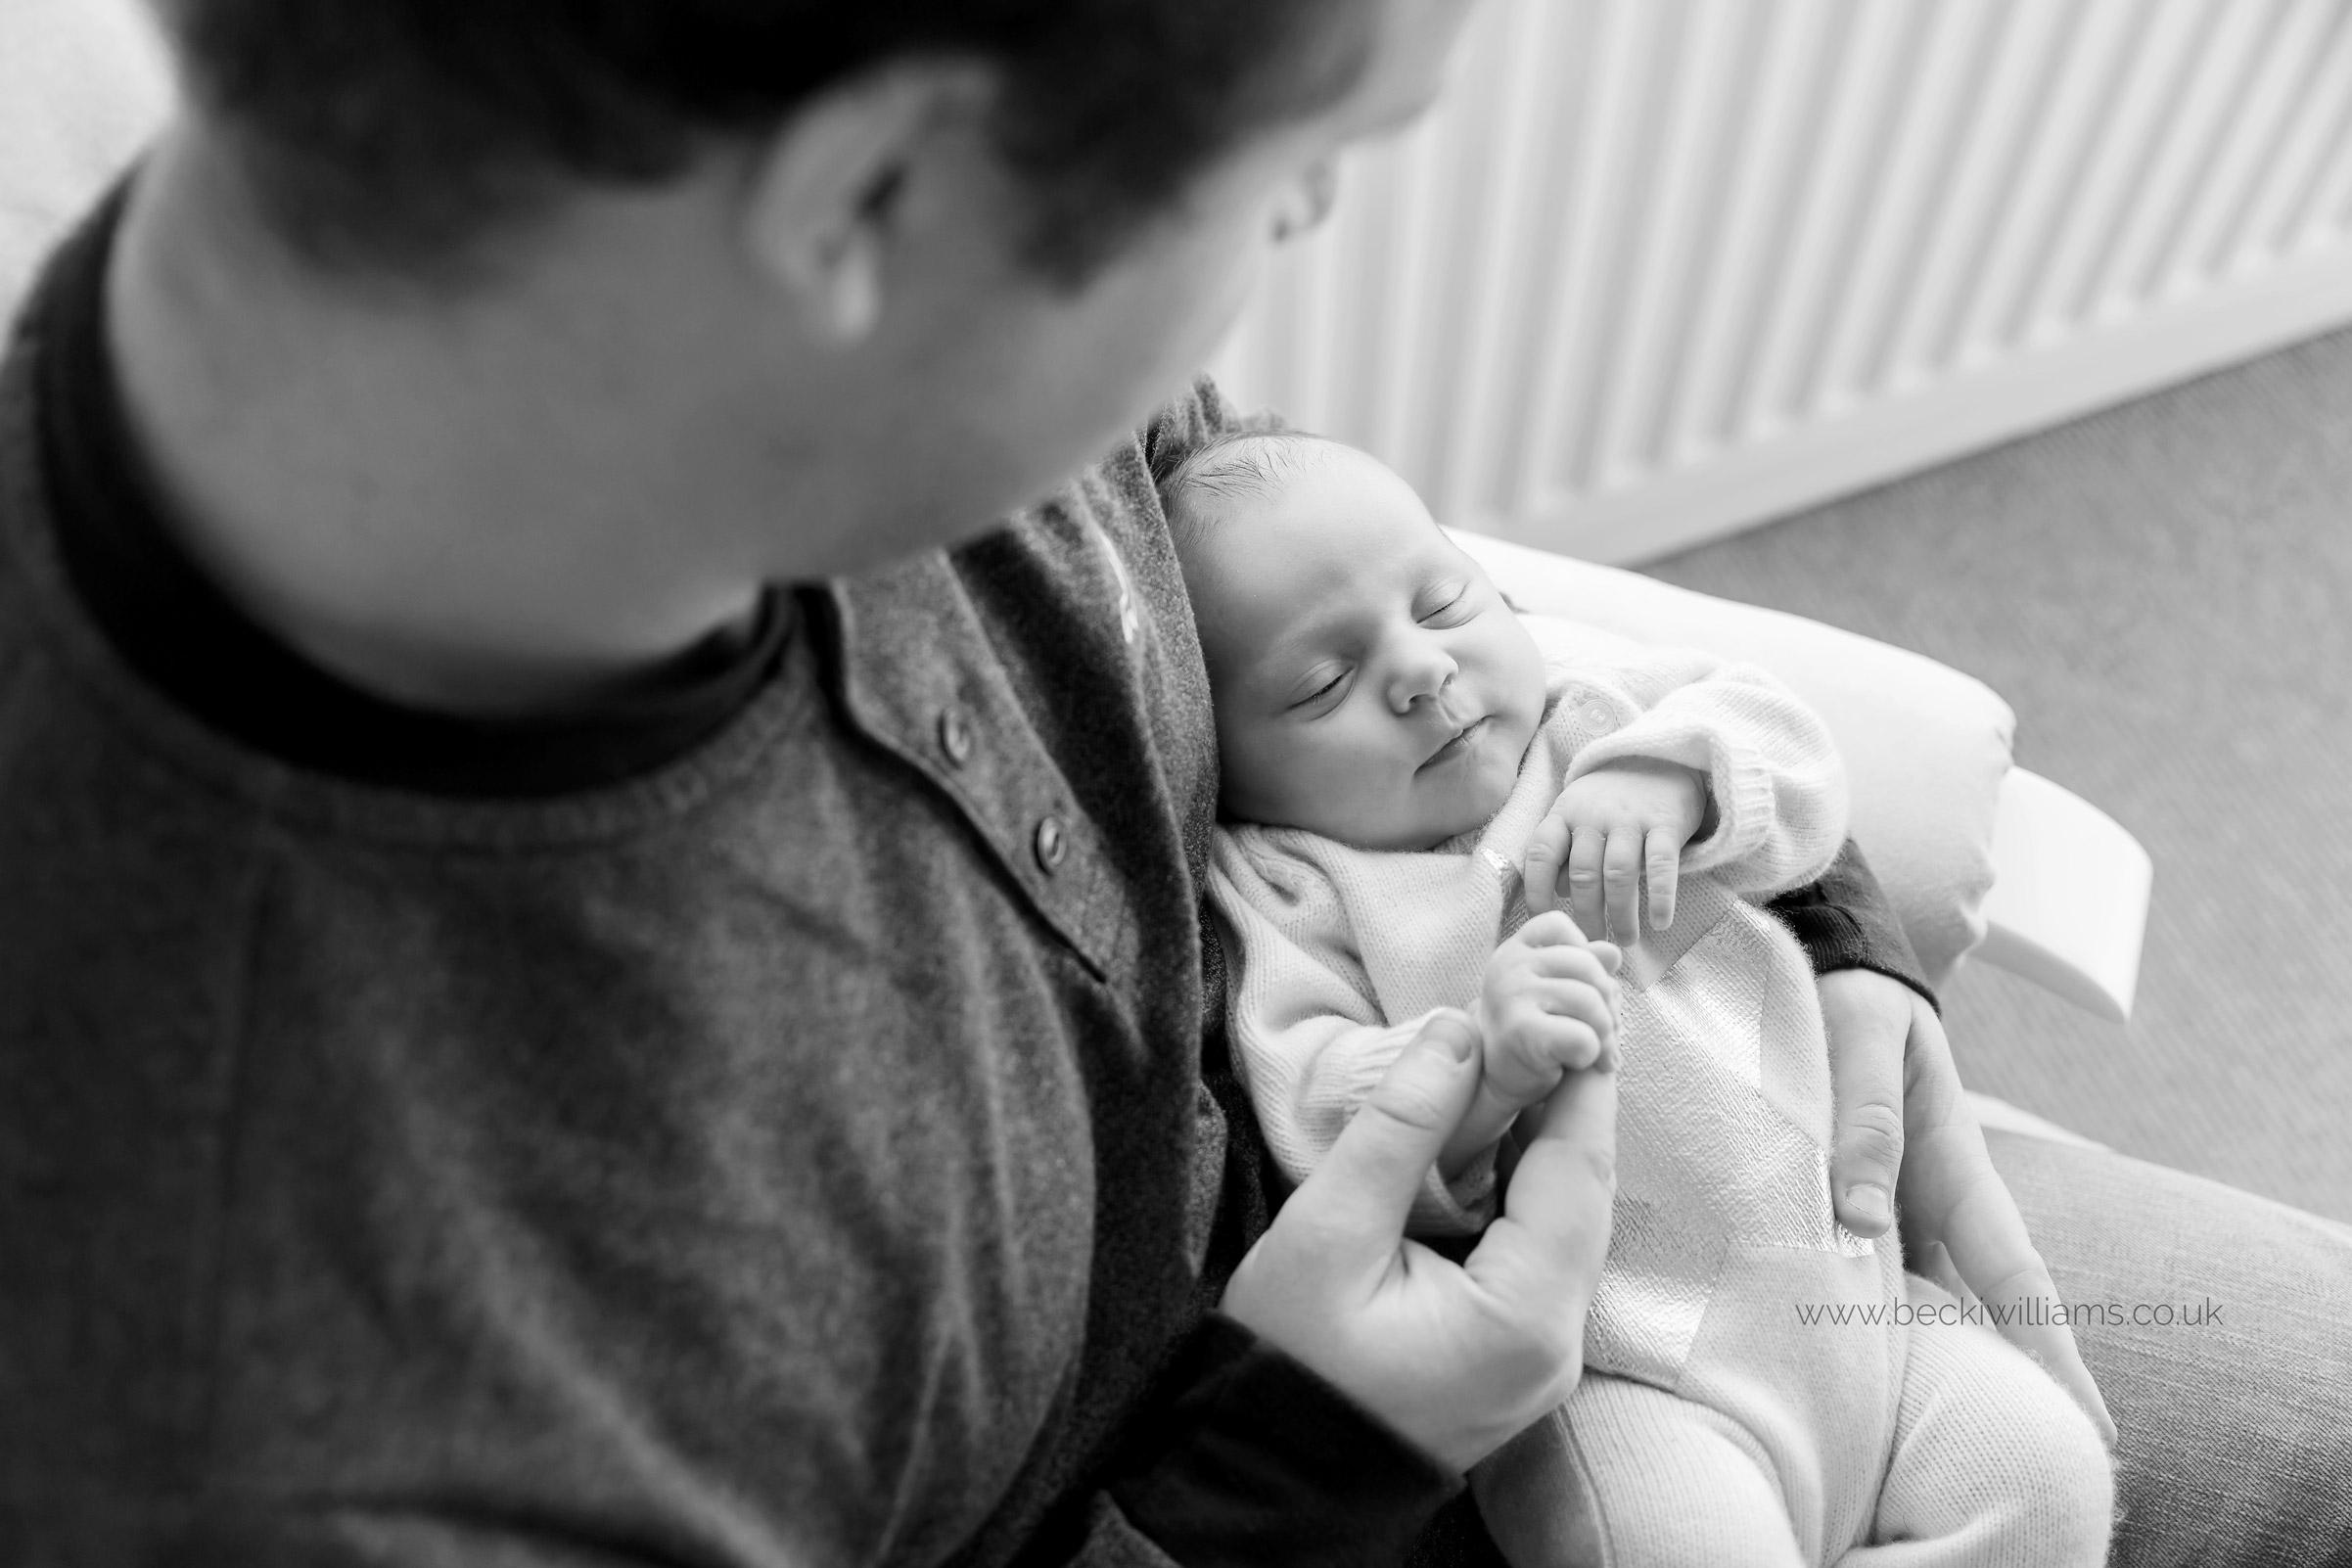 lifestyle-newborn-photography-hemel-hempstead-redbourn-at-home-new-dad-nursery-becki-williams-photography.jpg